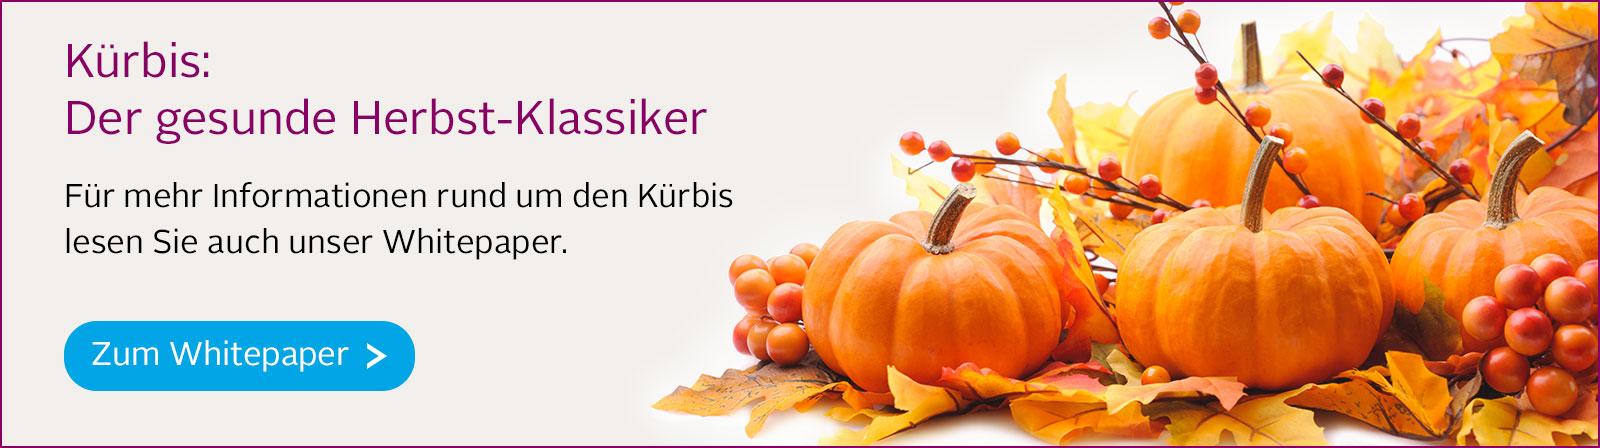 Banner kuerbis-